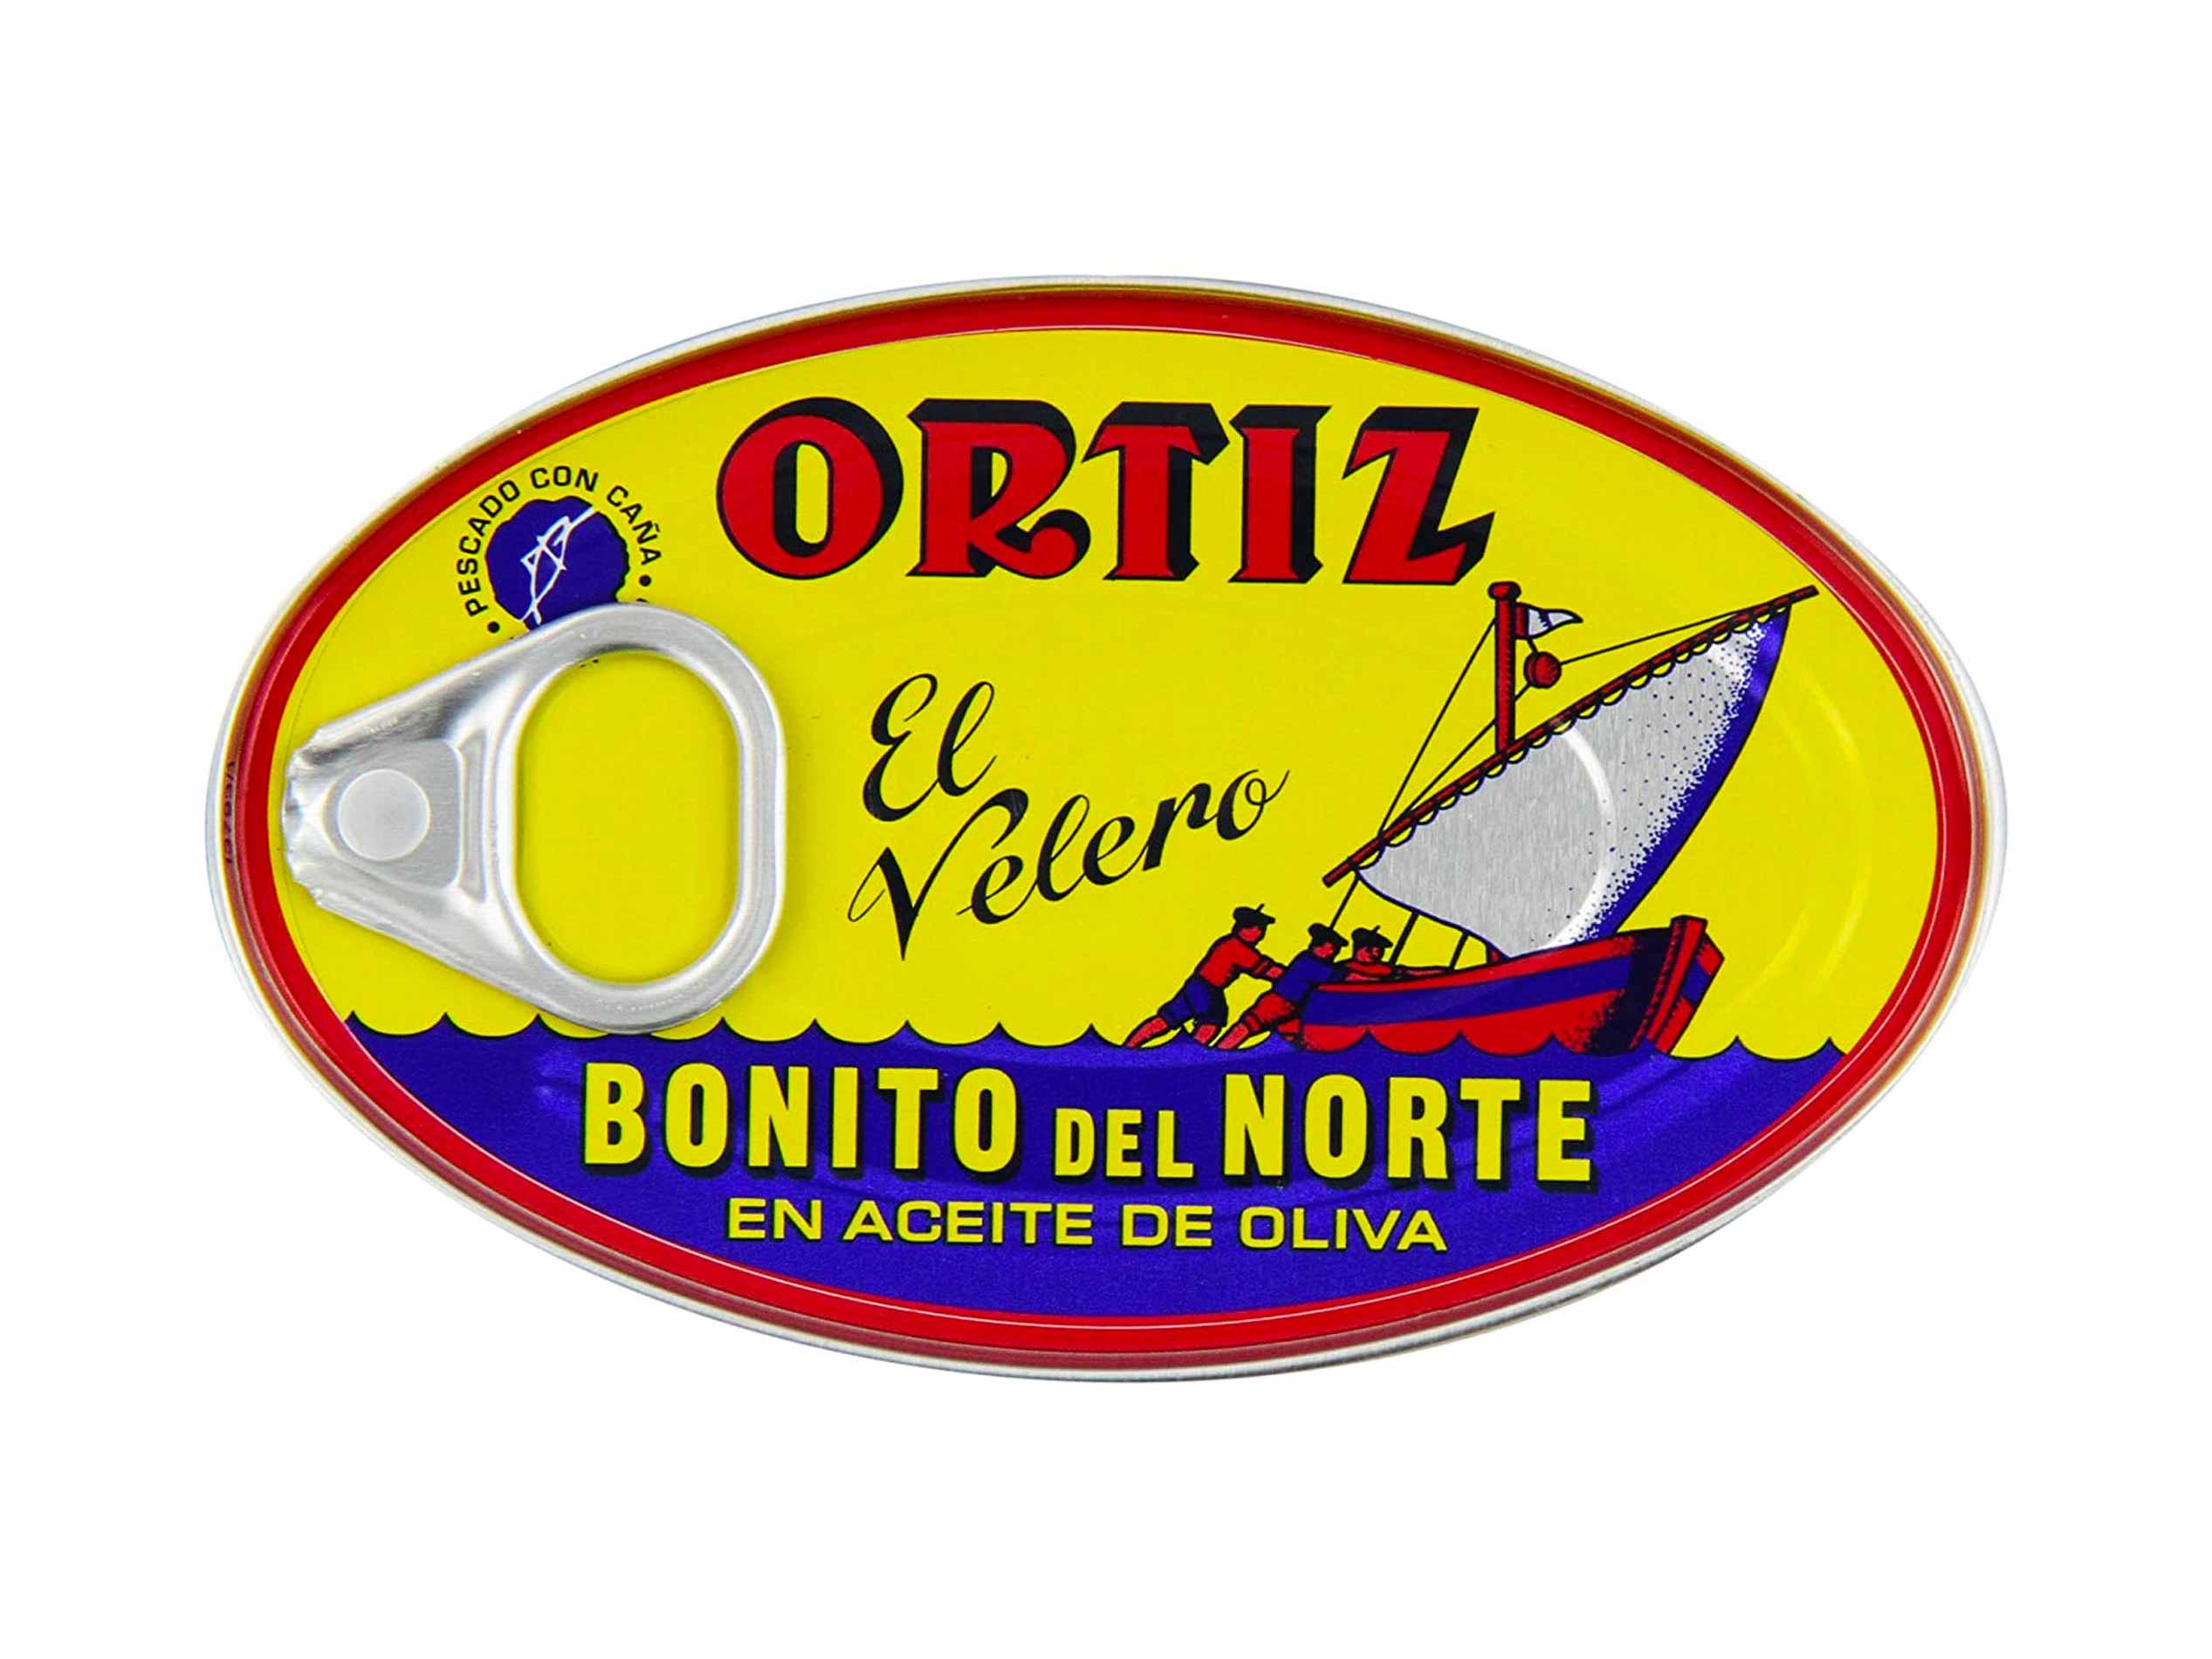 Ortiz Bonito Del Norte Tuna In Olive Oil 3.95 oz Oval Tin (Spain) 12 pack